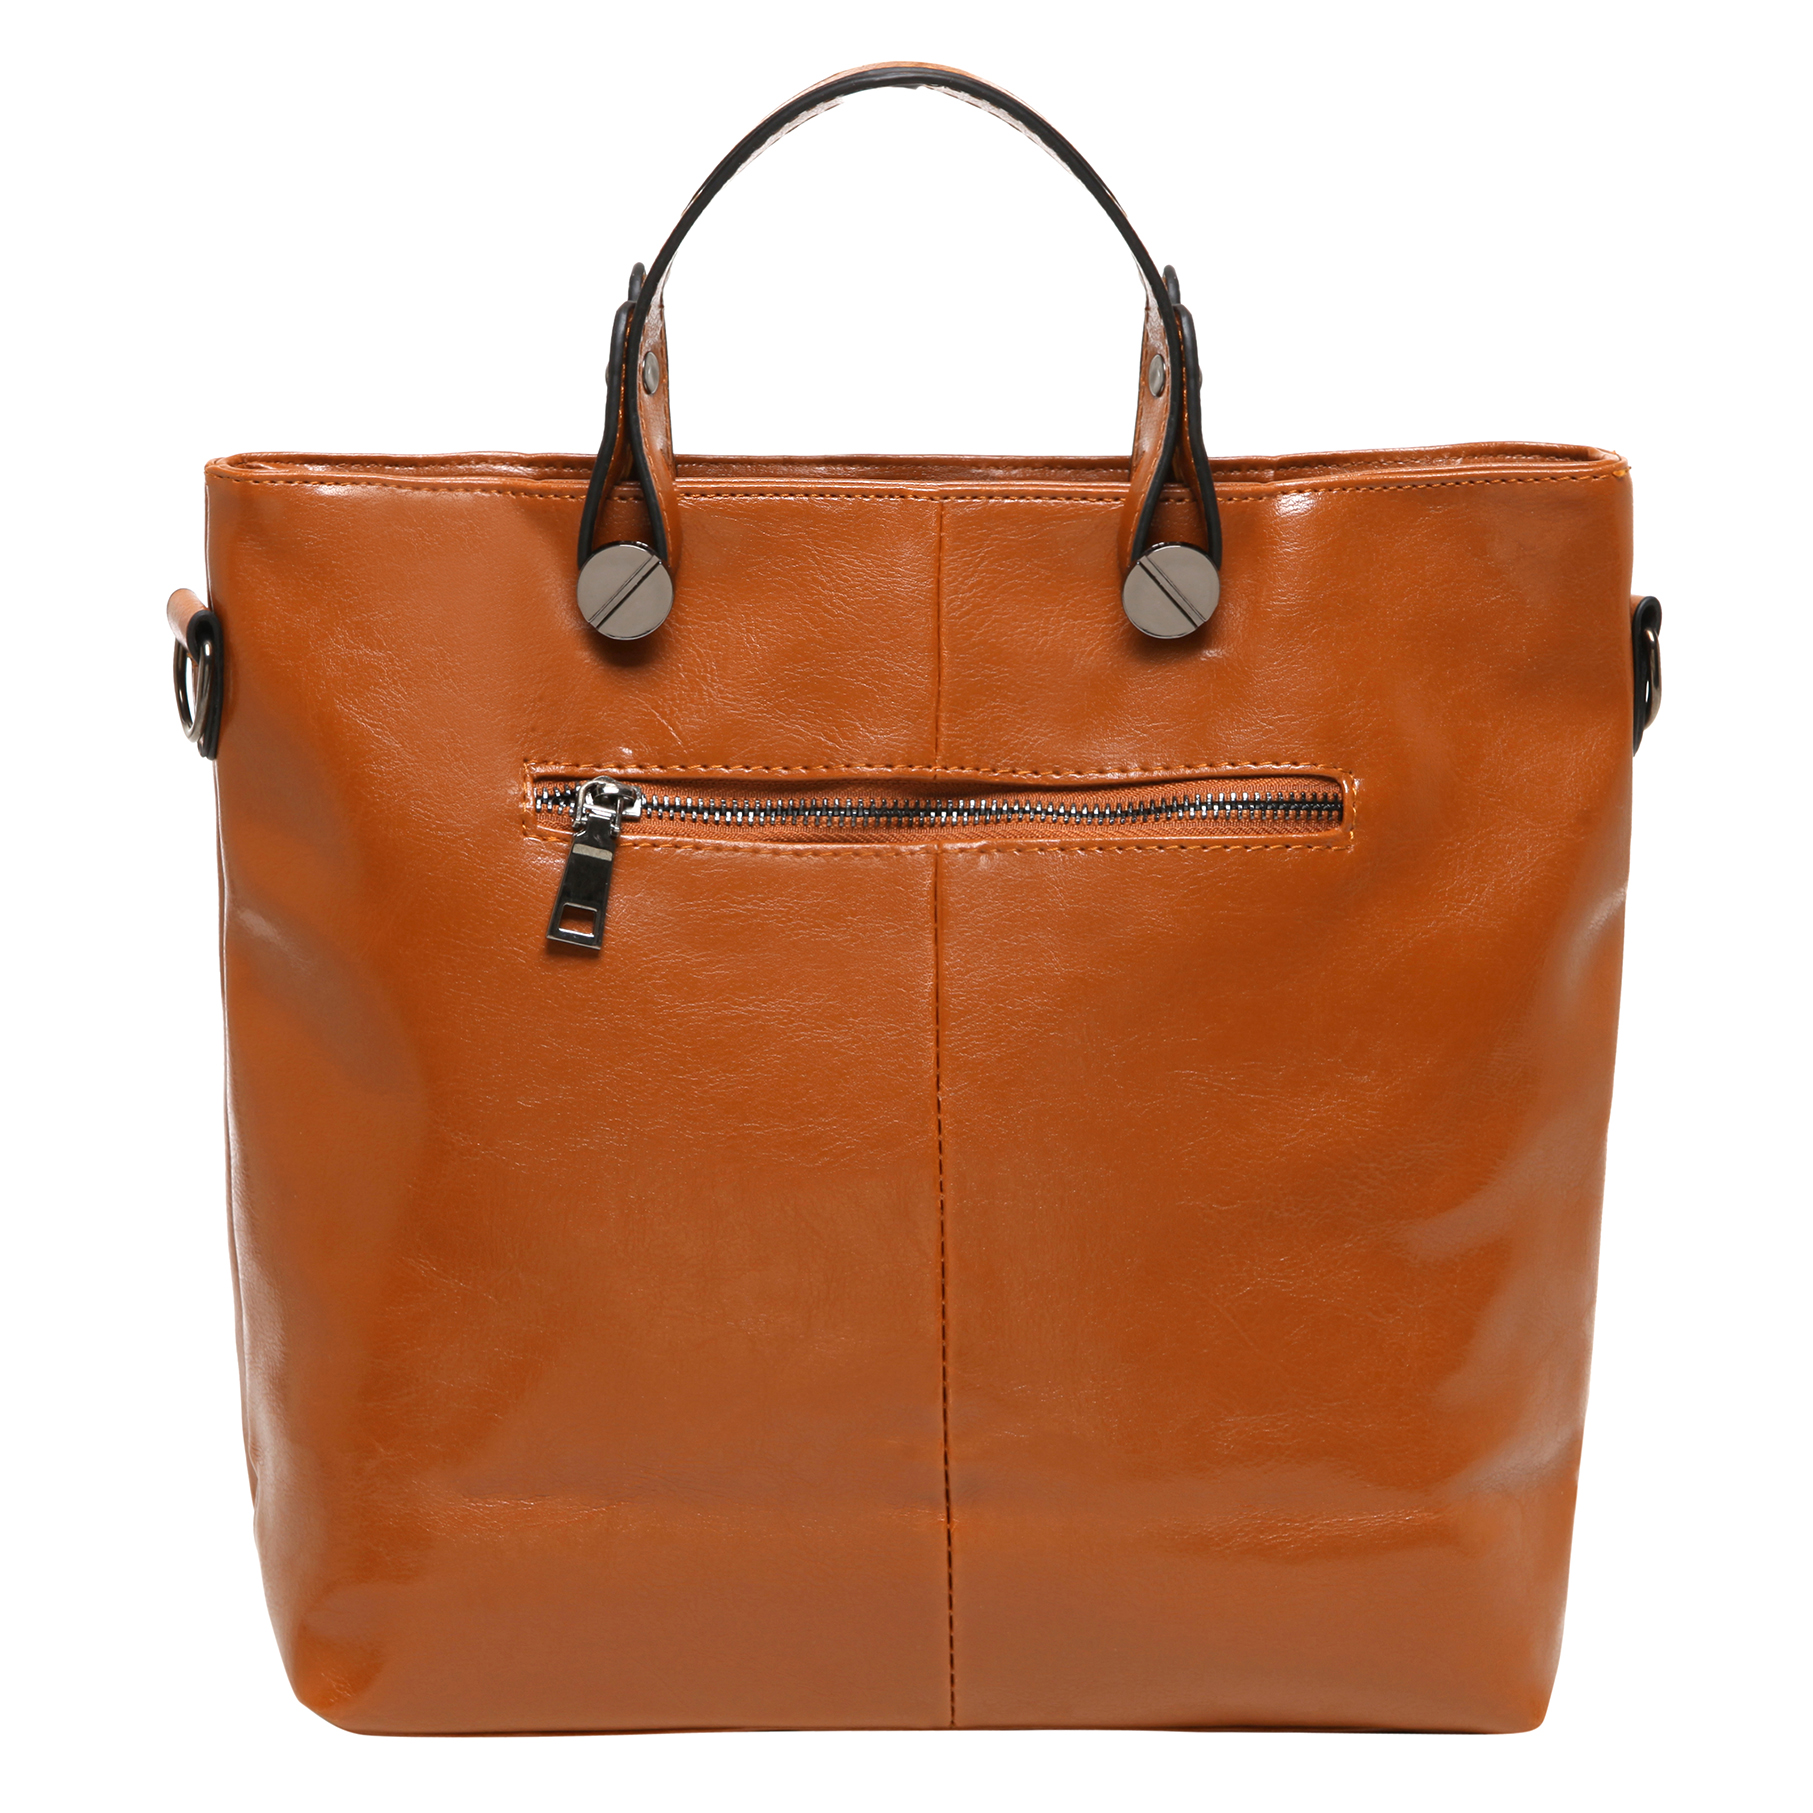 ALDIS Brown Top Handle Office Tote Handbag back